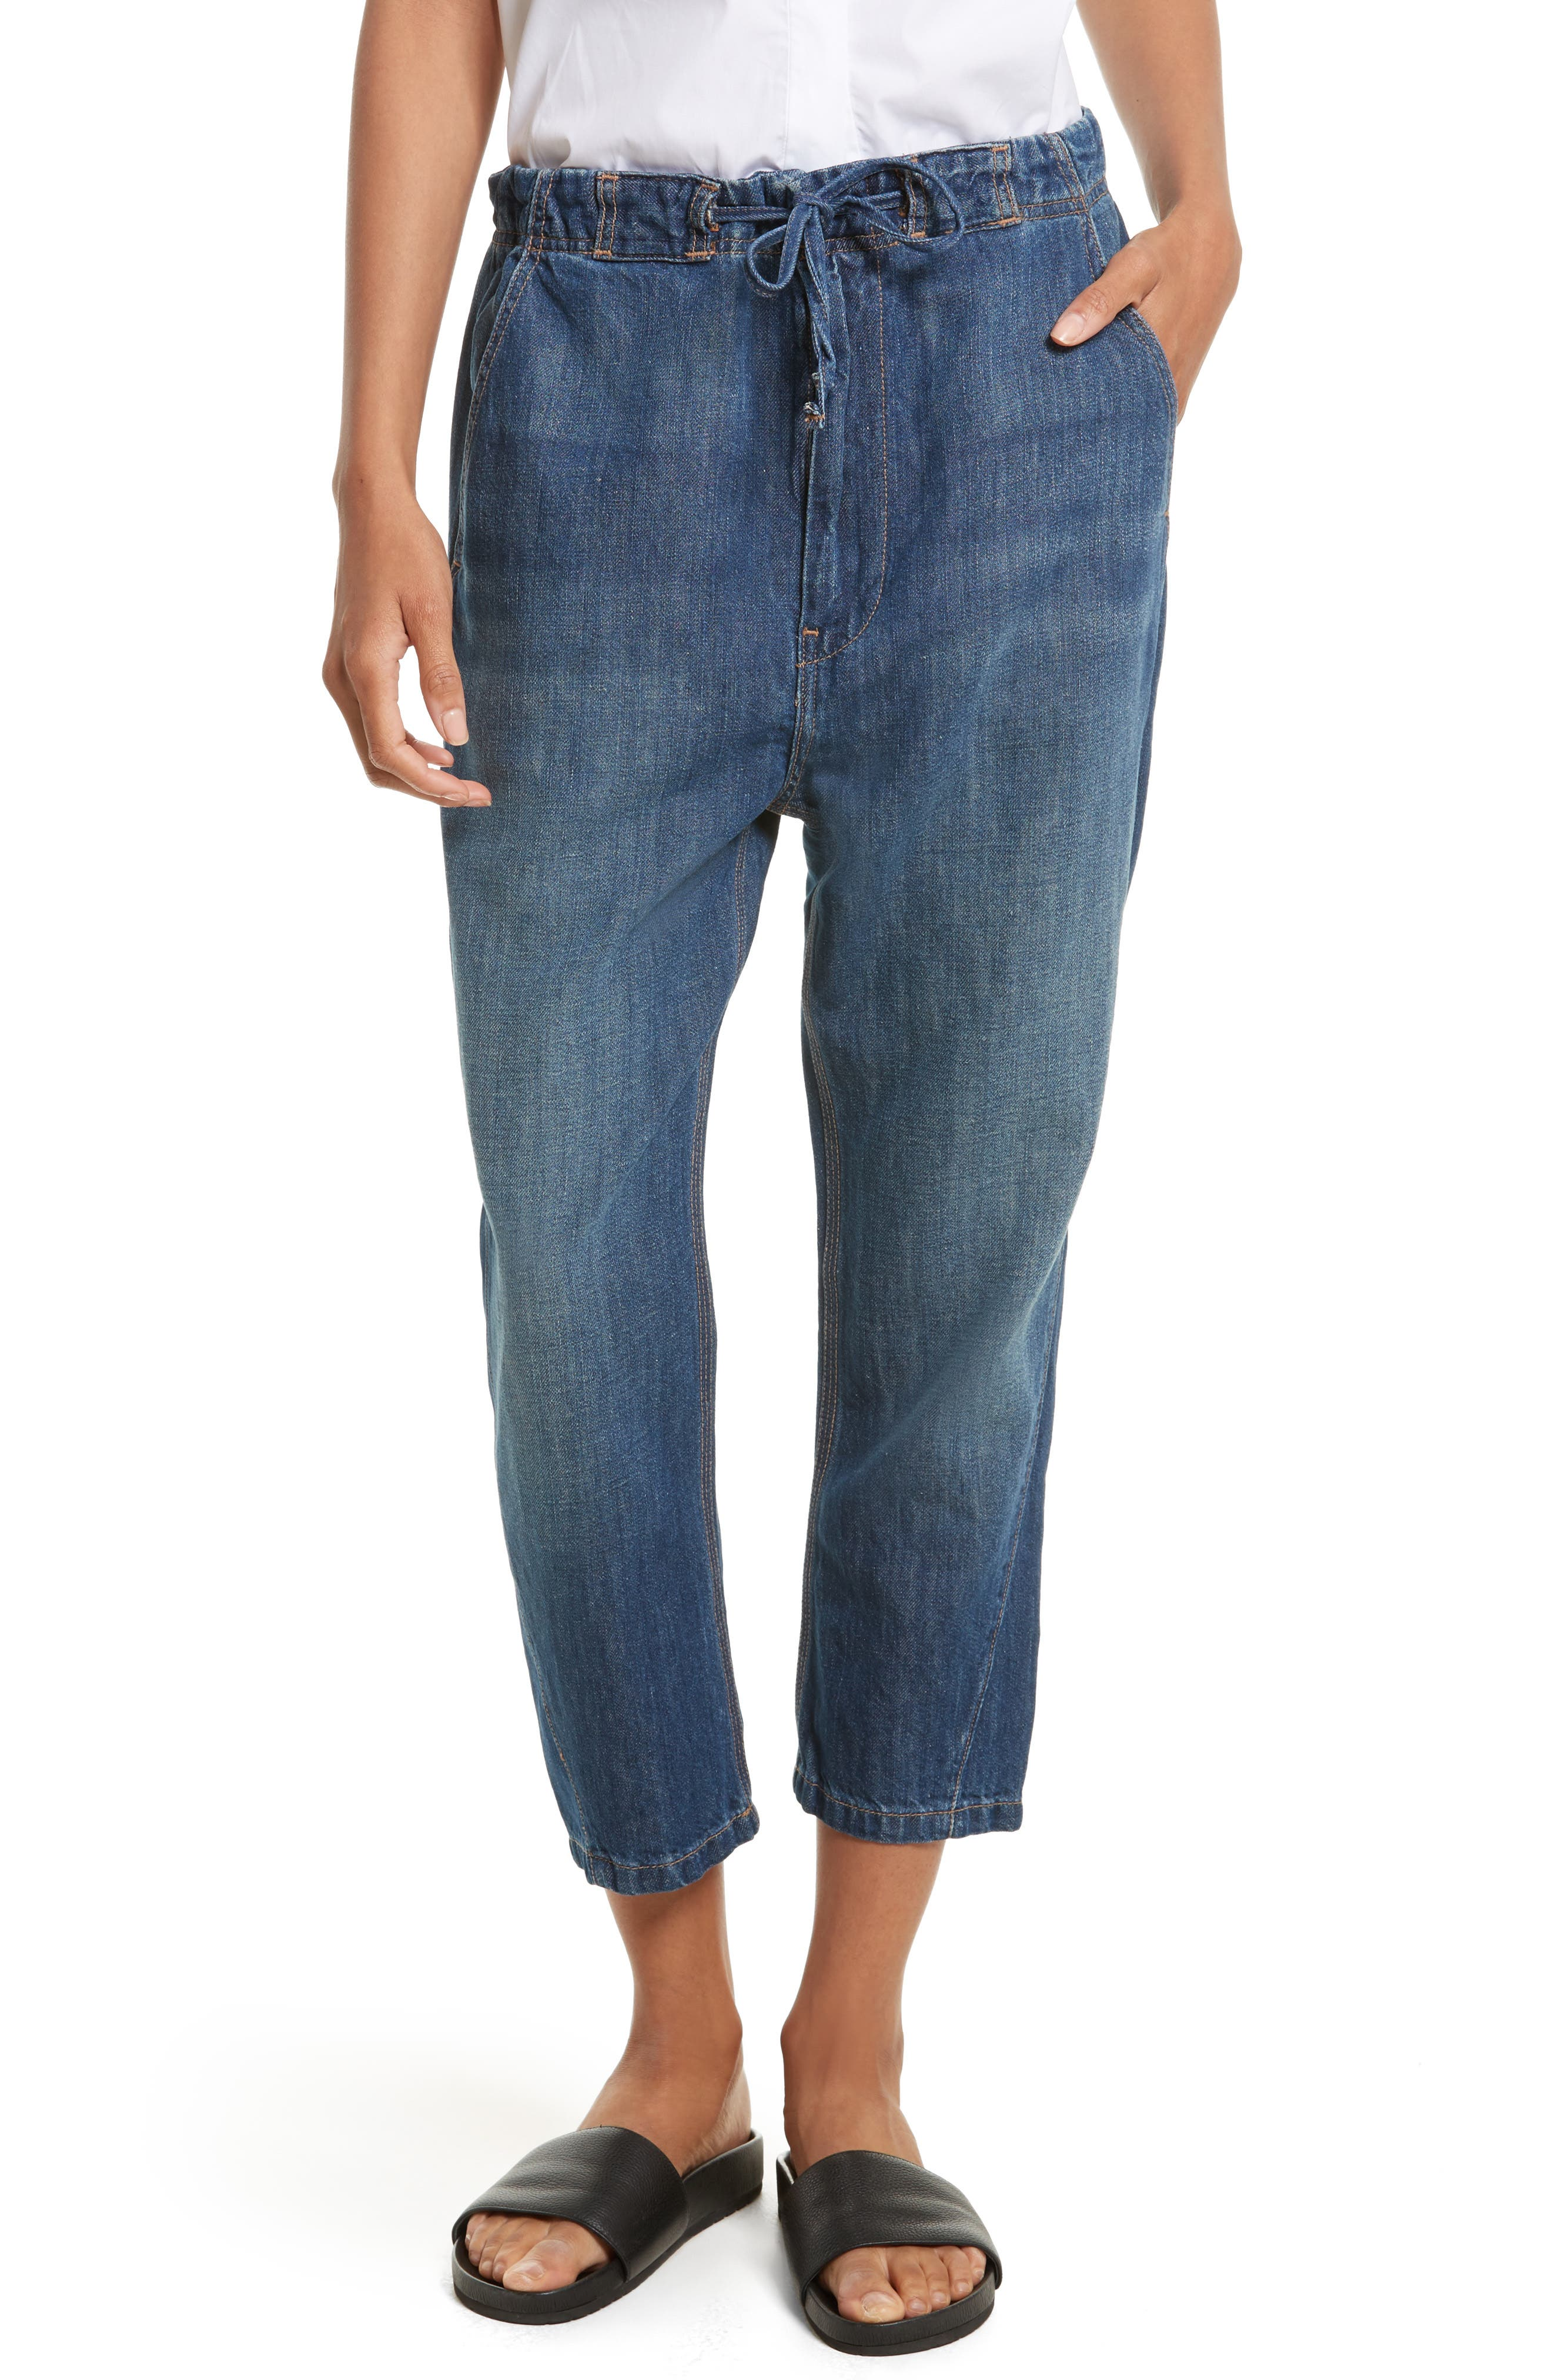 Alternate Image 1 Selected - Vince Cotton & Linen Denim Drawstring Workwear Trousers